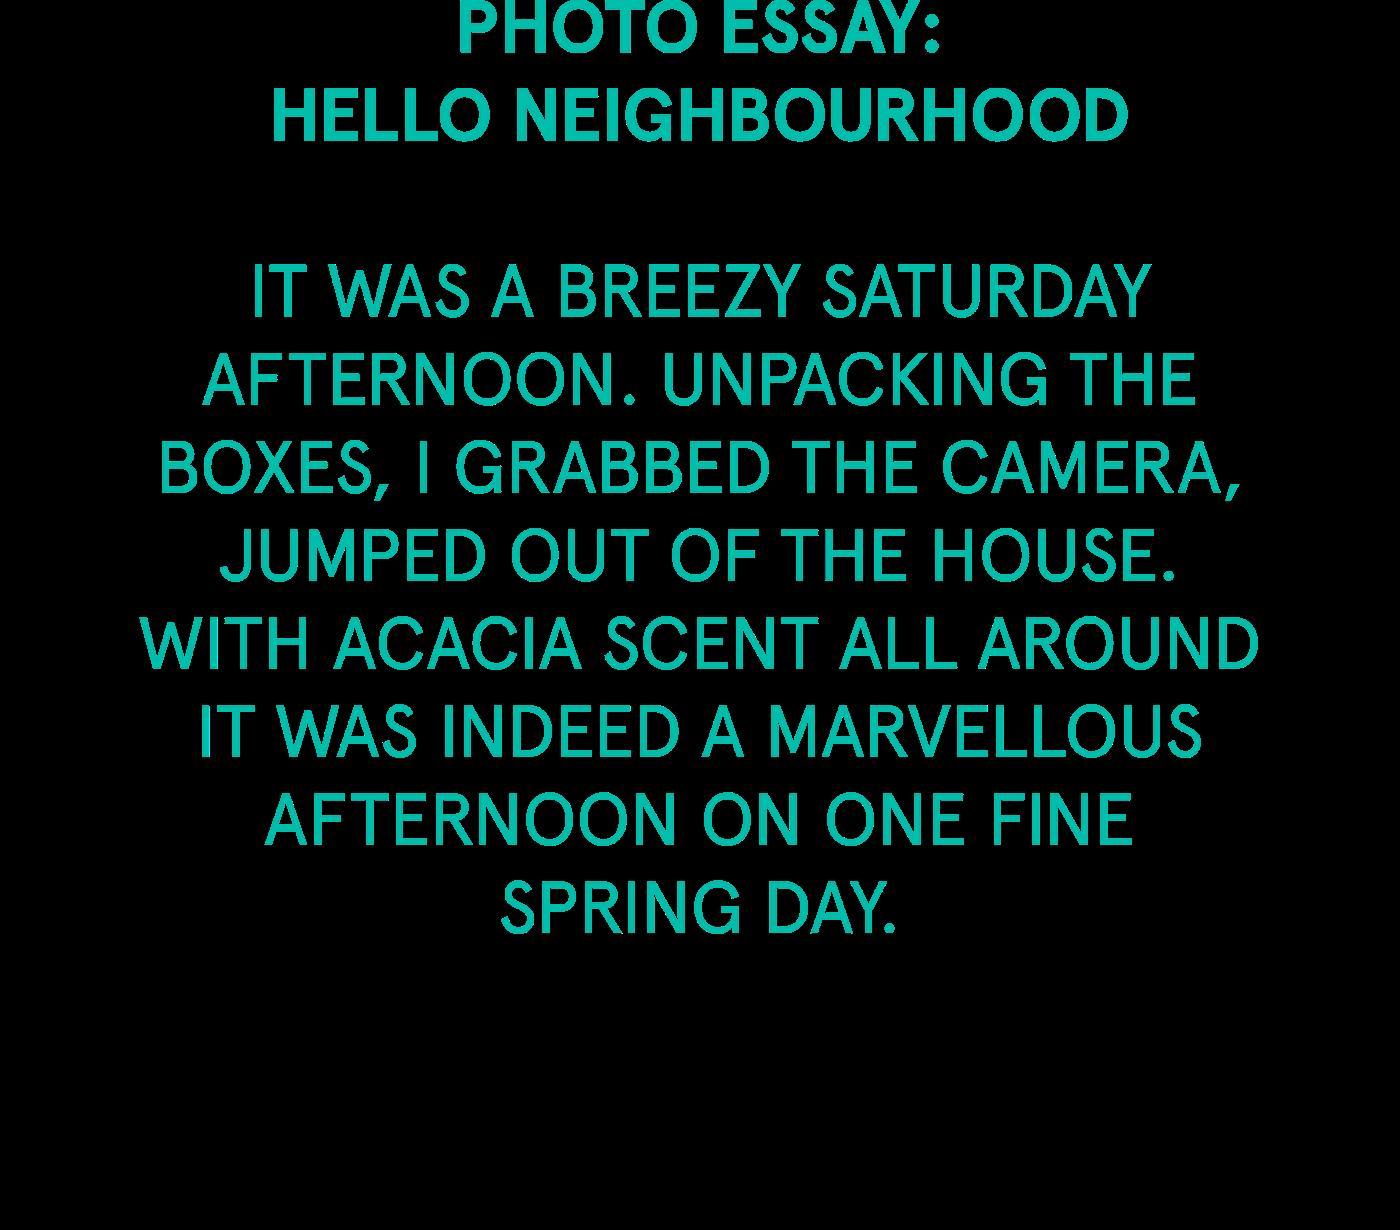 Neighbourhood essay